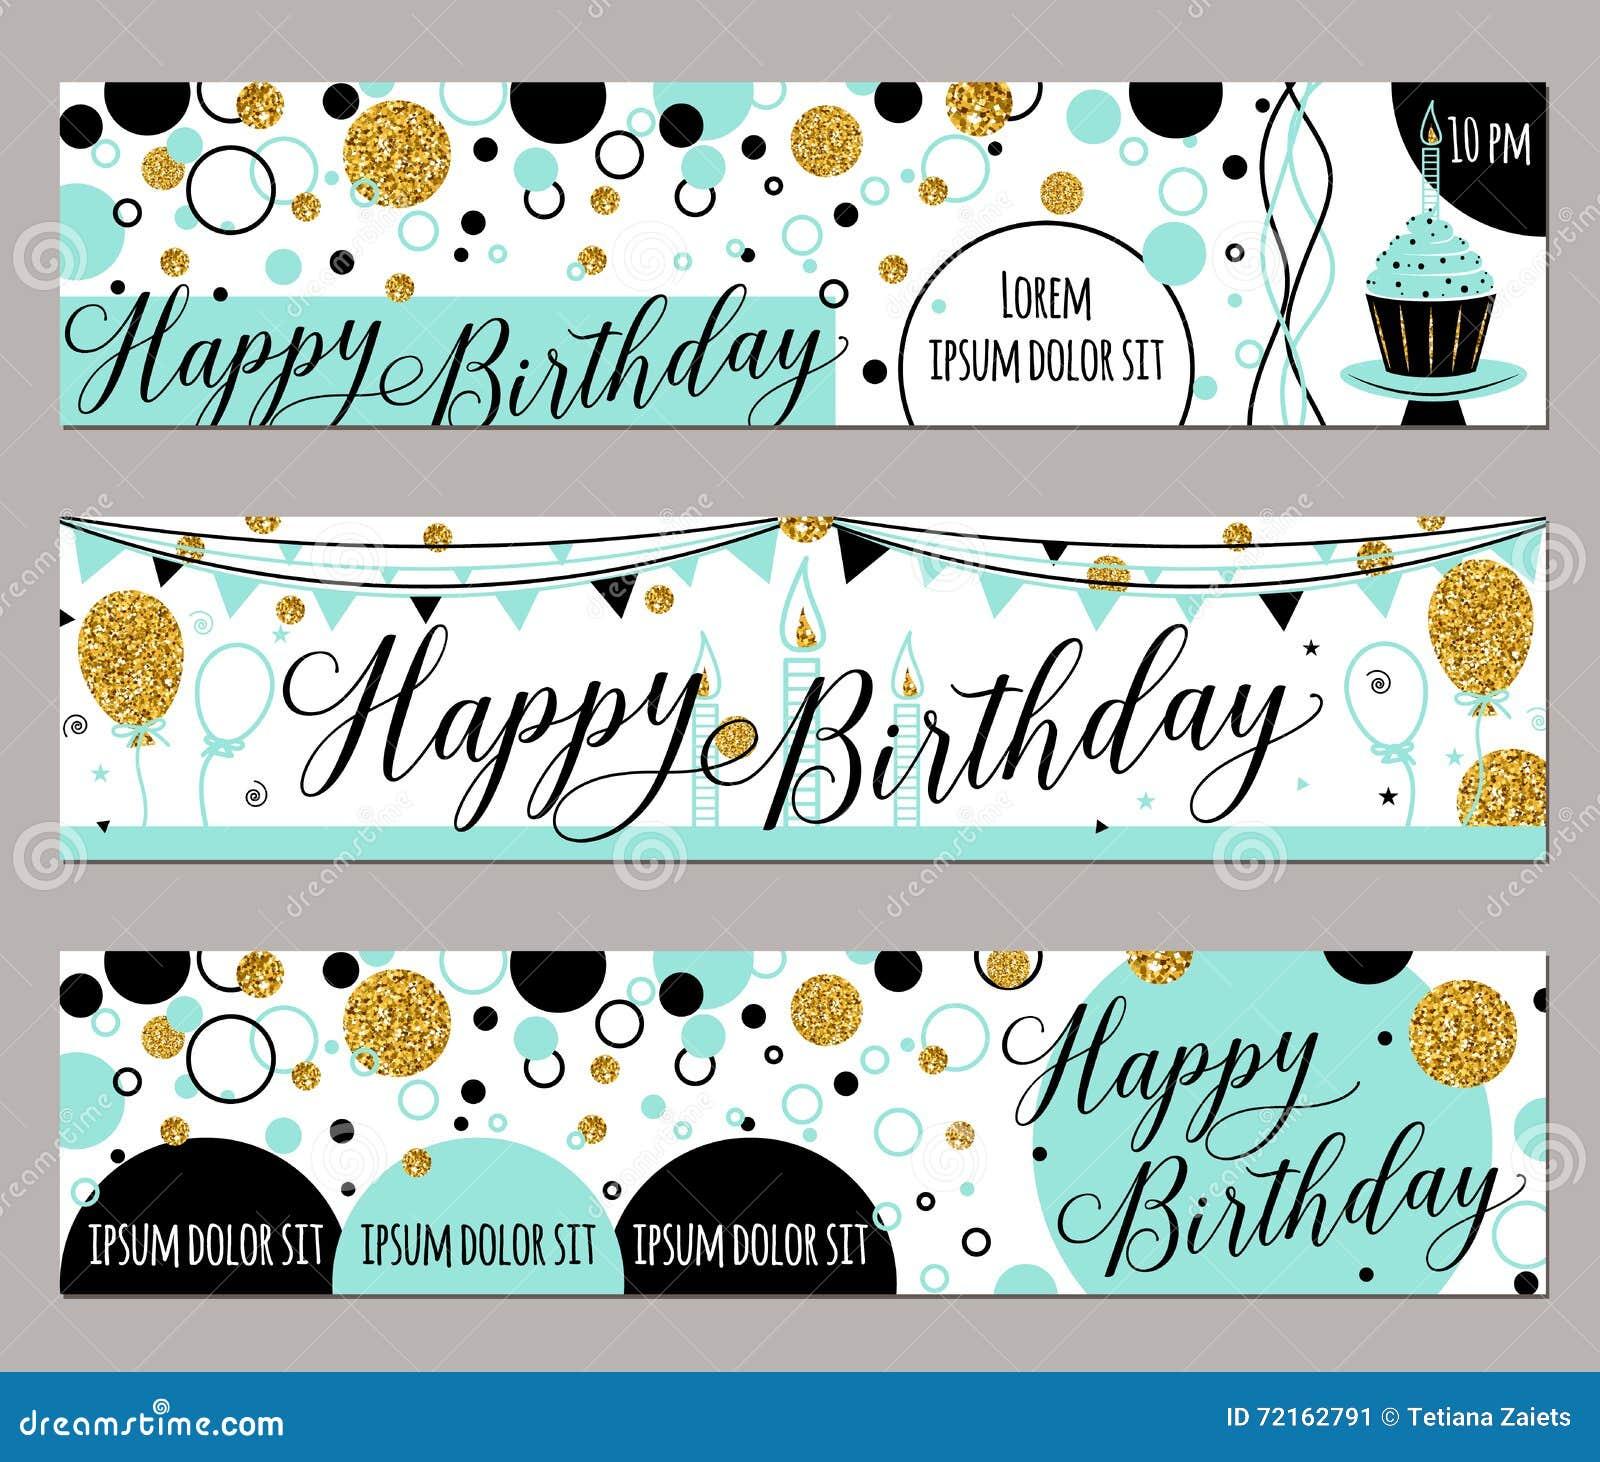 Vector Illustration Of Happy Birthday Cards Fashion Background – Fashion Birthday Cards